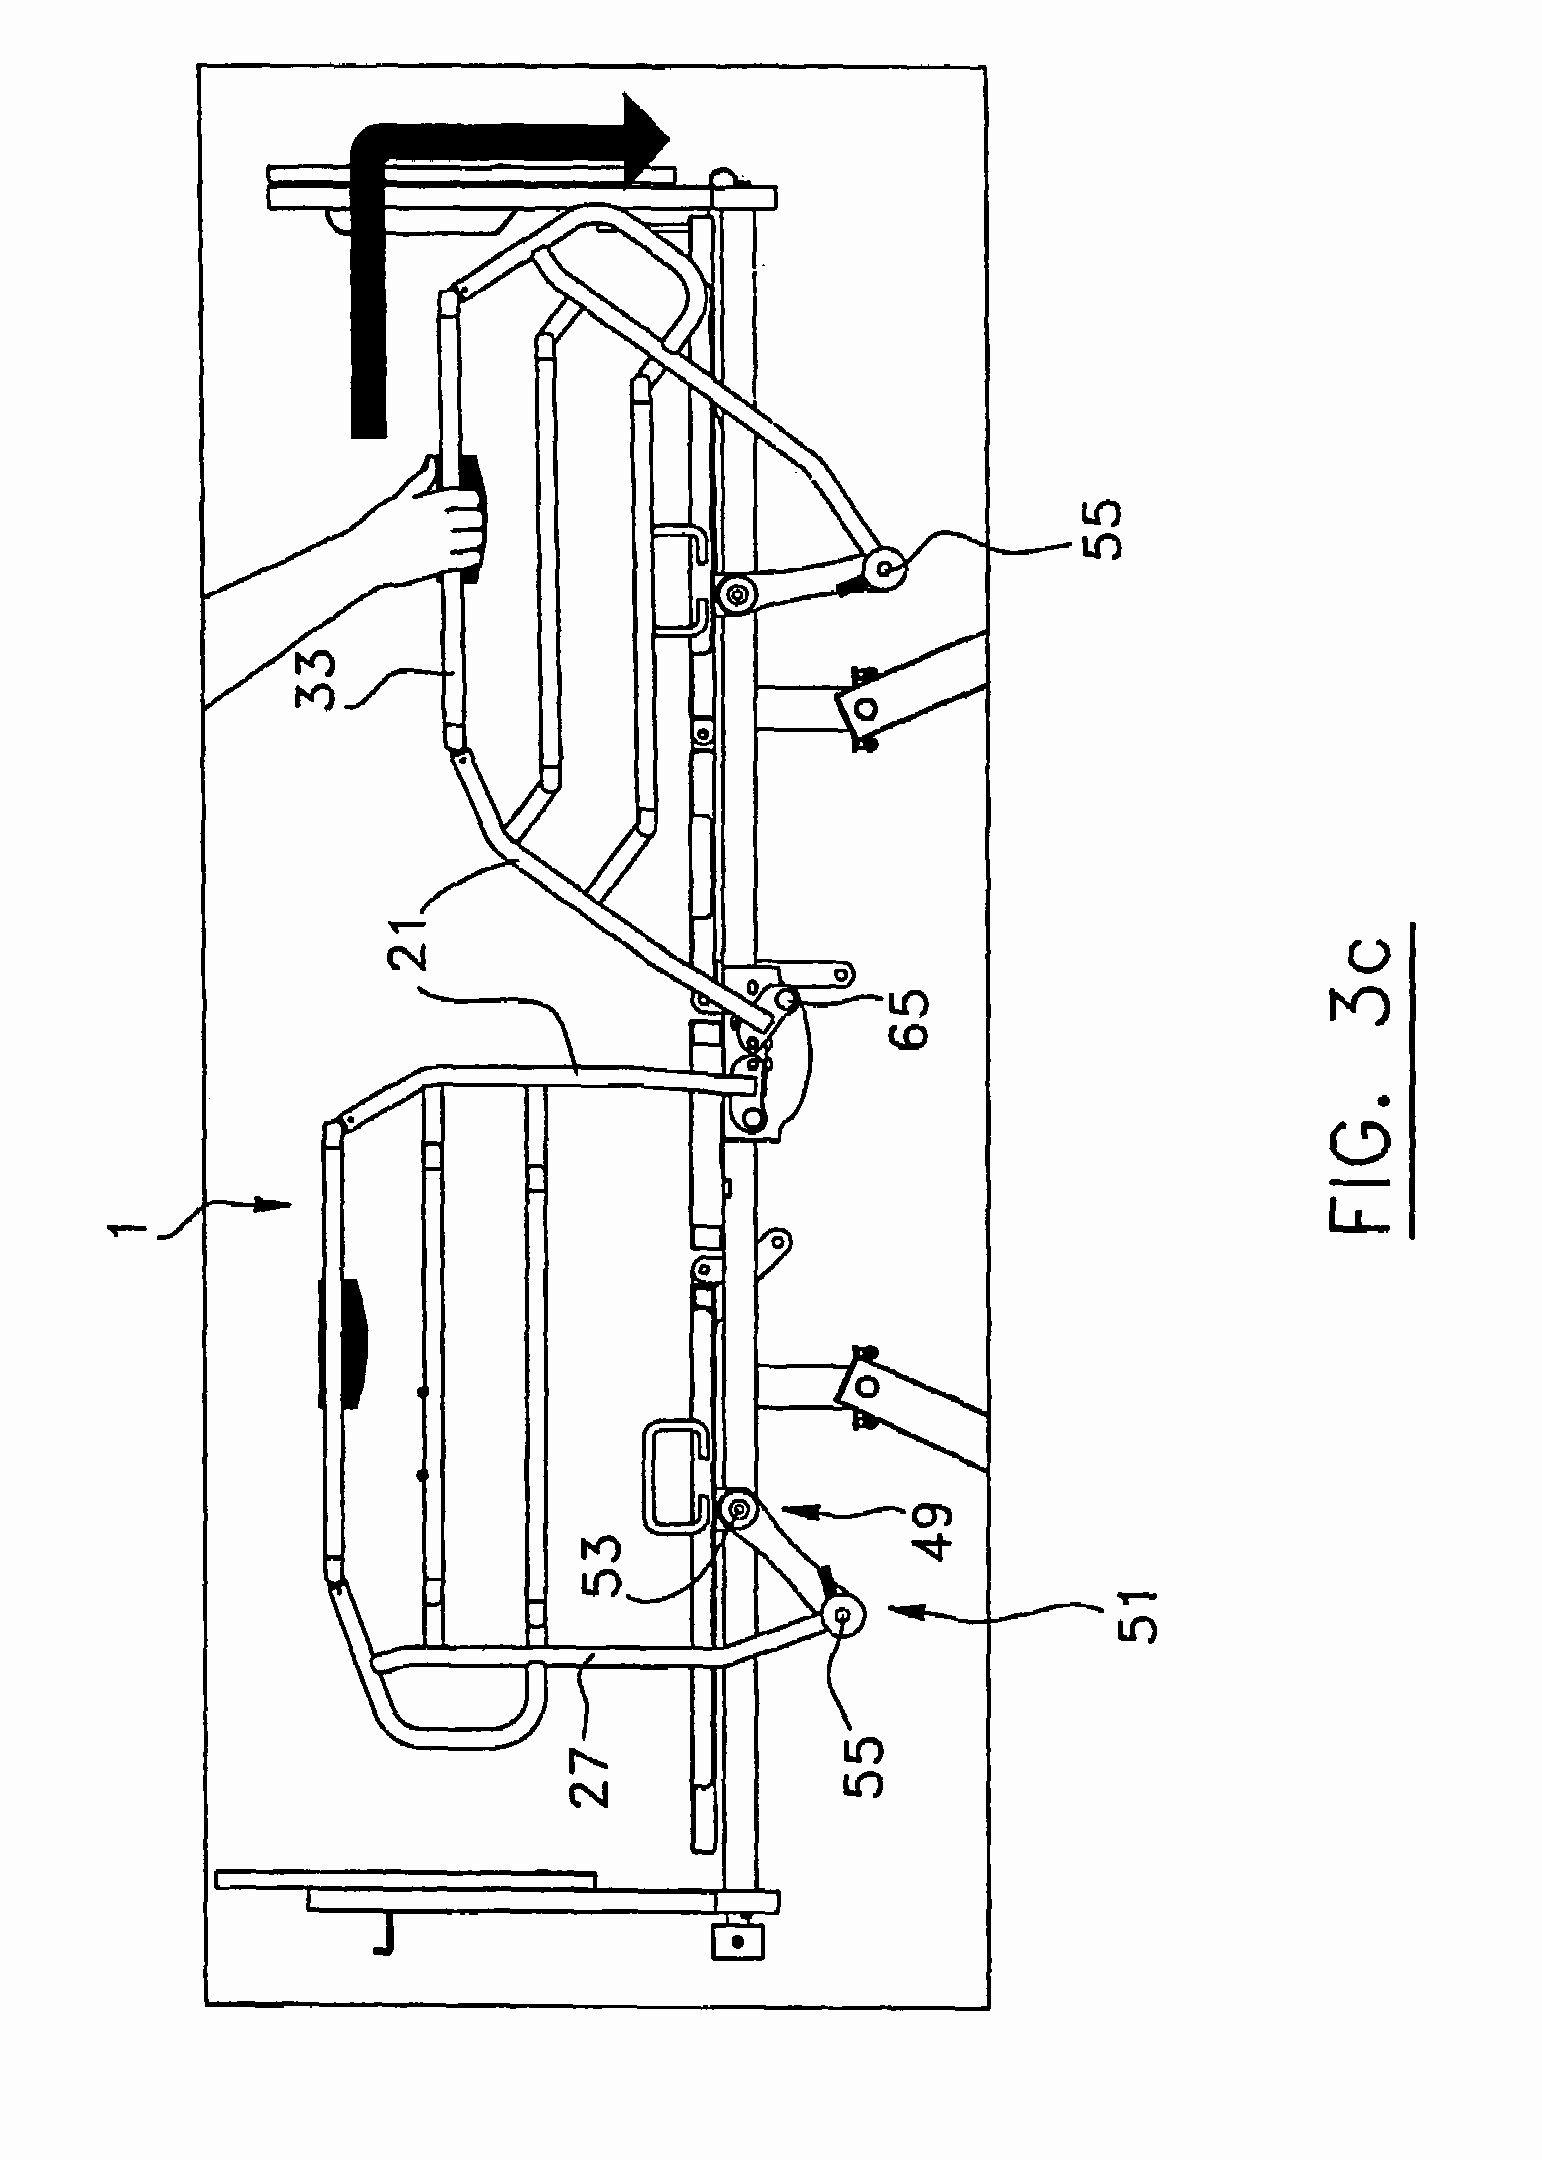 Three Wire Alternator Wiring Diagram Gm Valid Gm